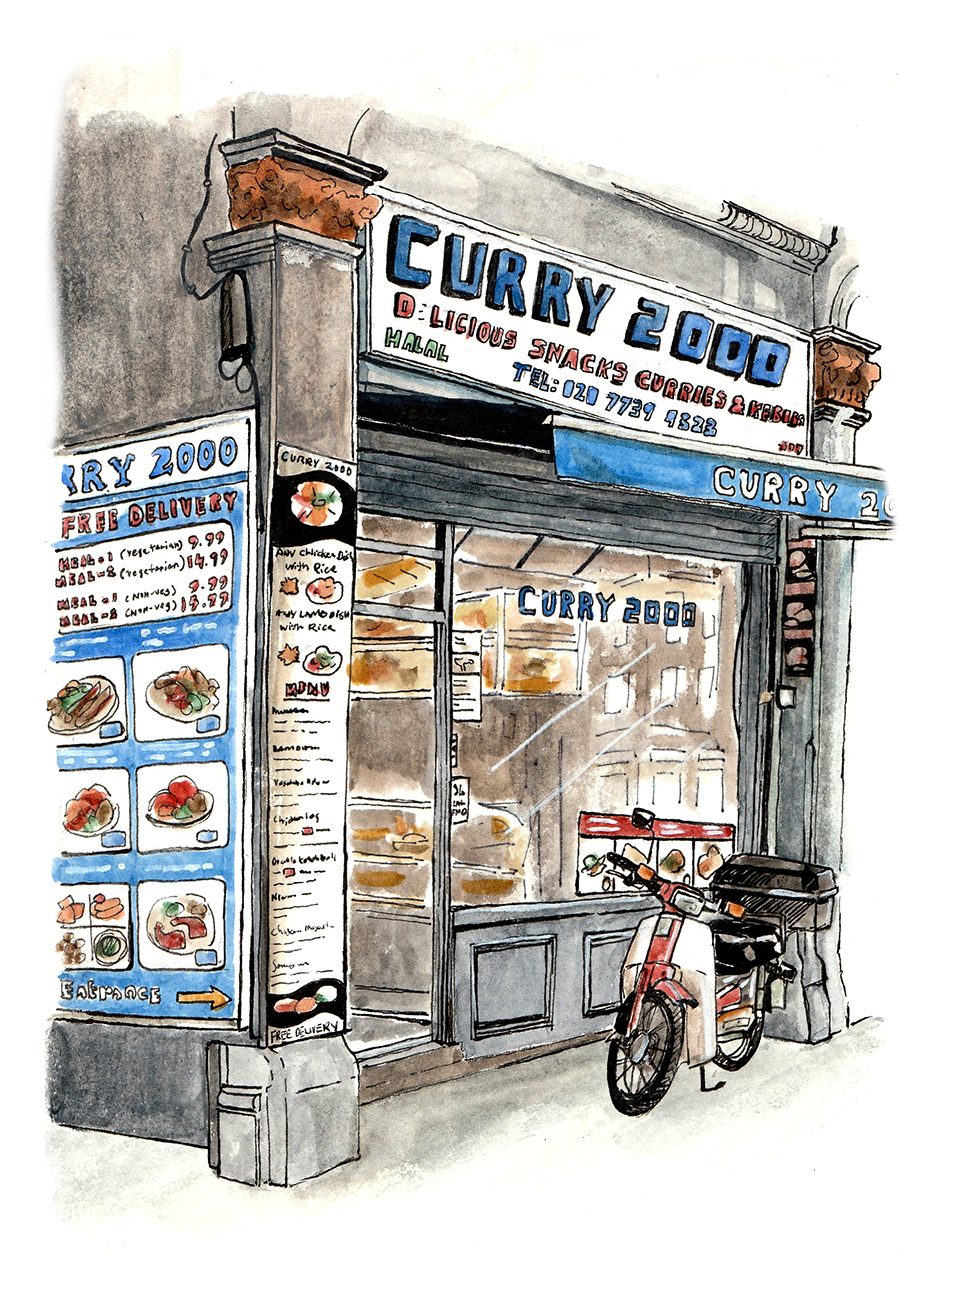 Curry2000_ElizabethLander.jpg